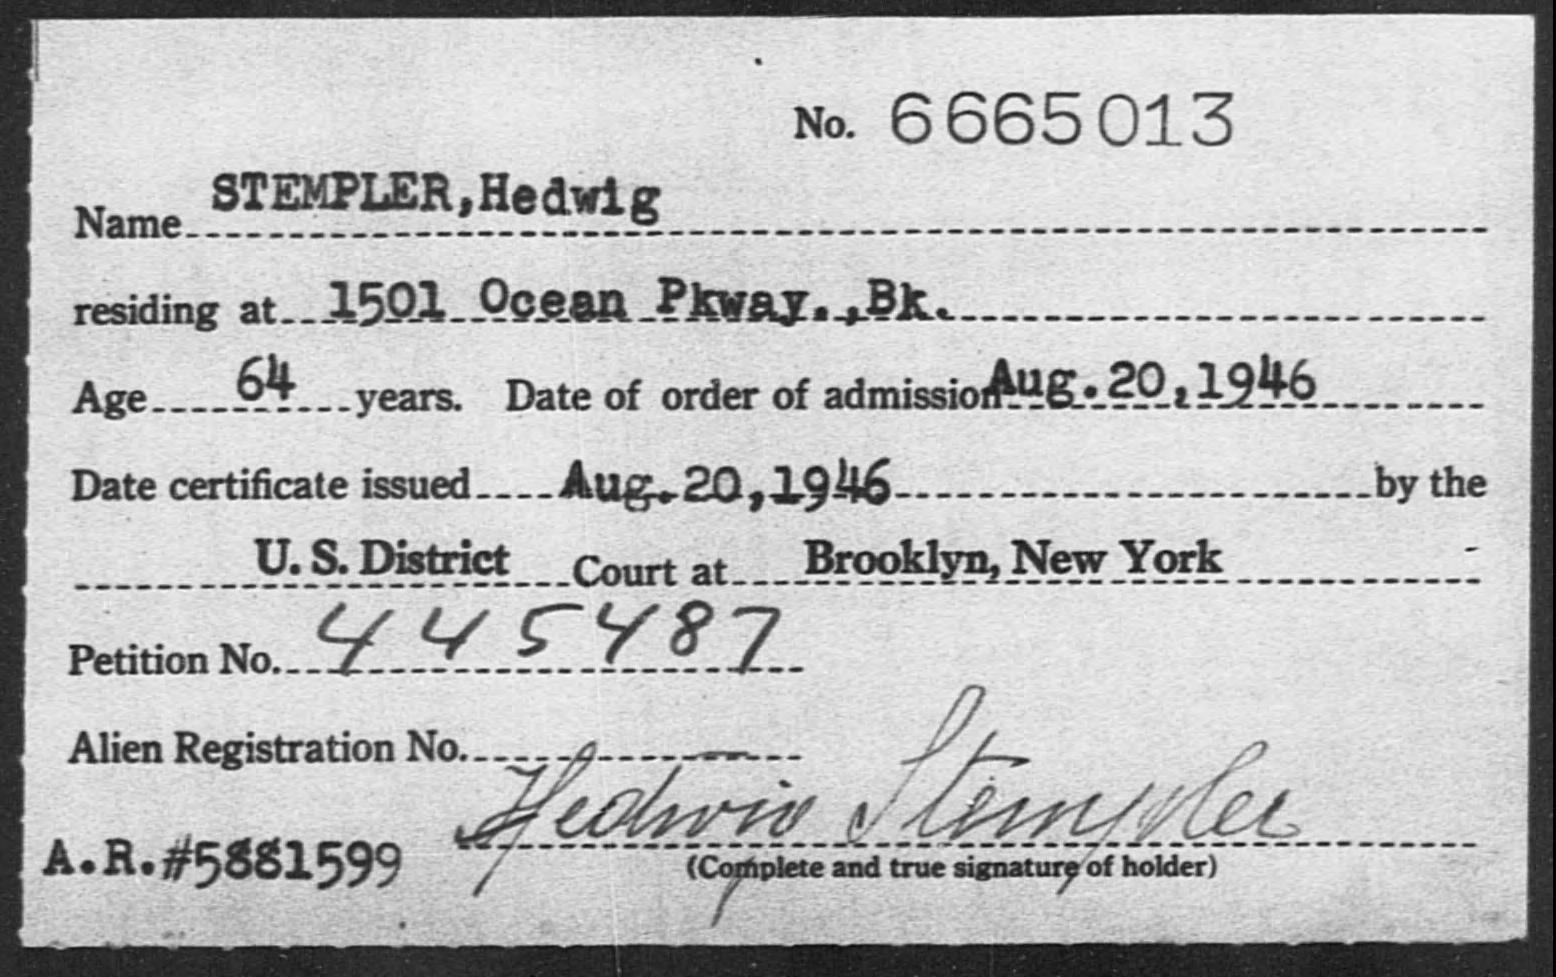 STEMPLER, Hedwig - Born: [BLANK], Naturalized: 1946